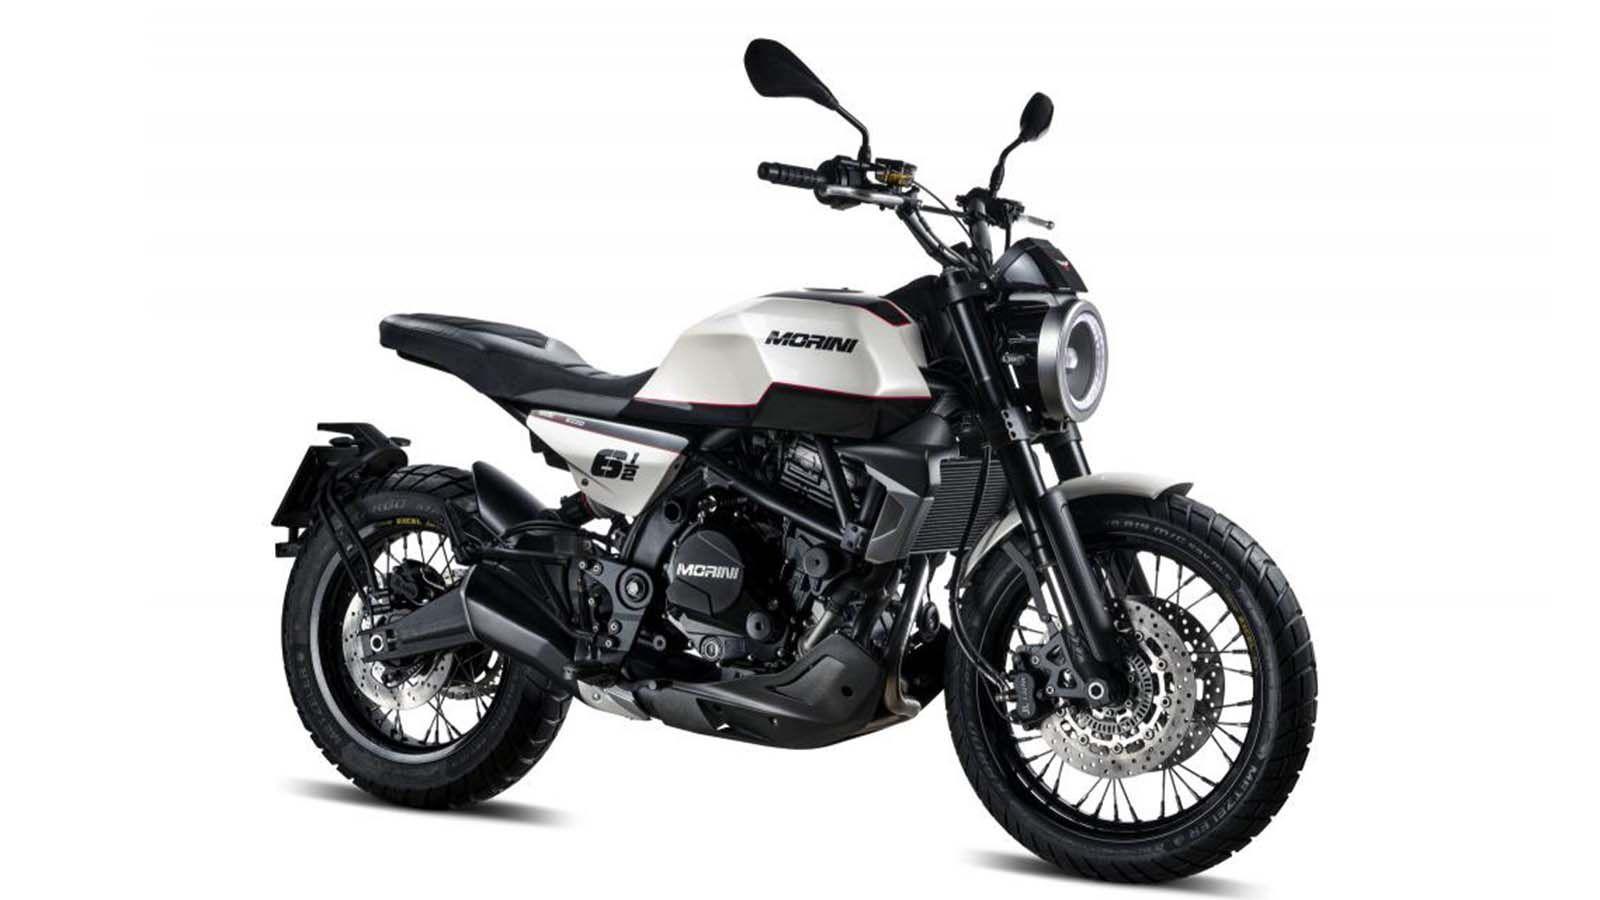 EICMA 2019: Νέο Moto Morini 650 - moto morini